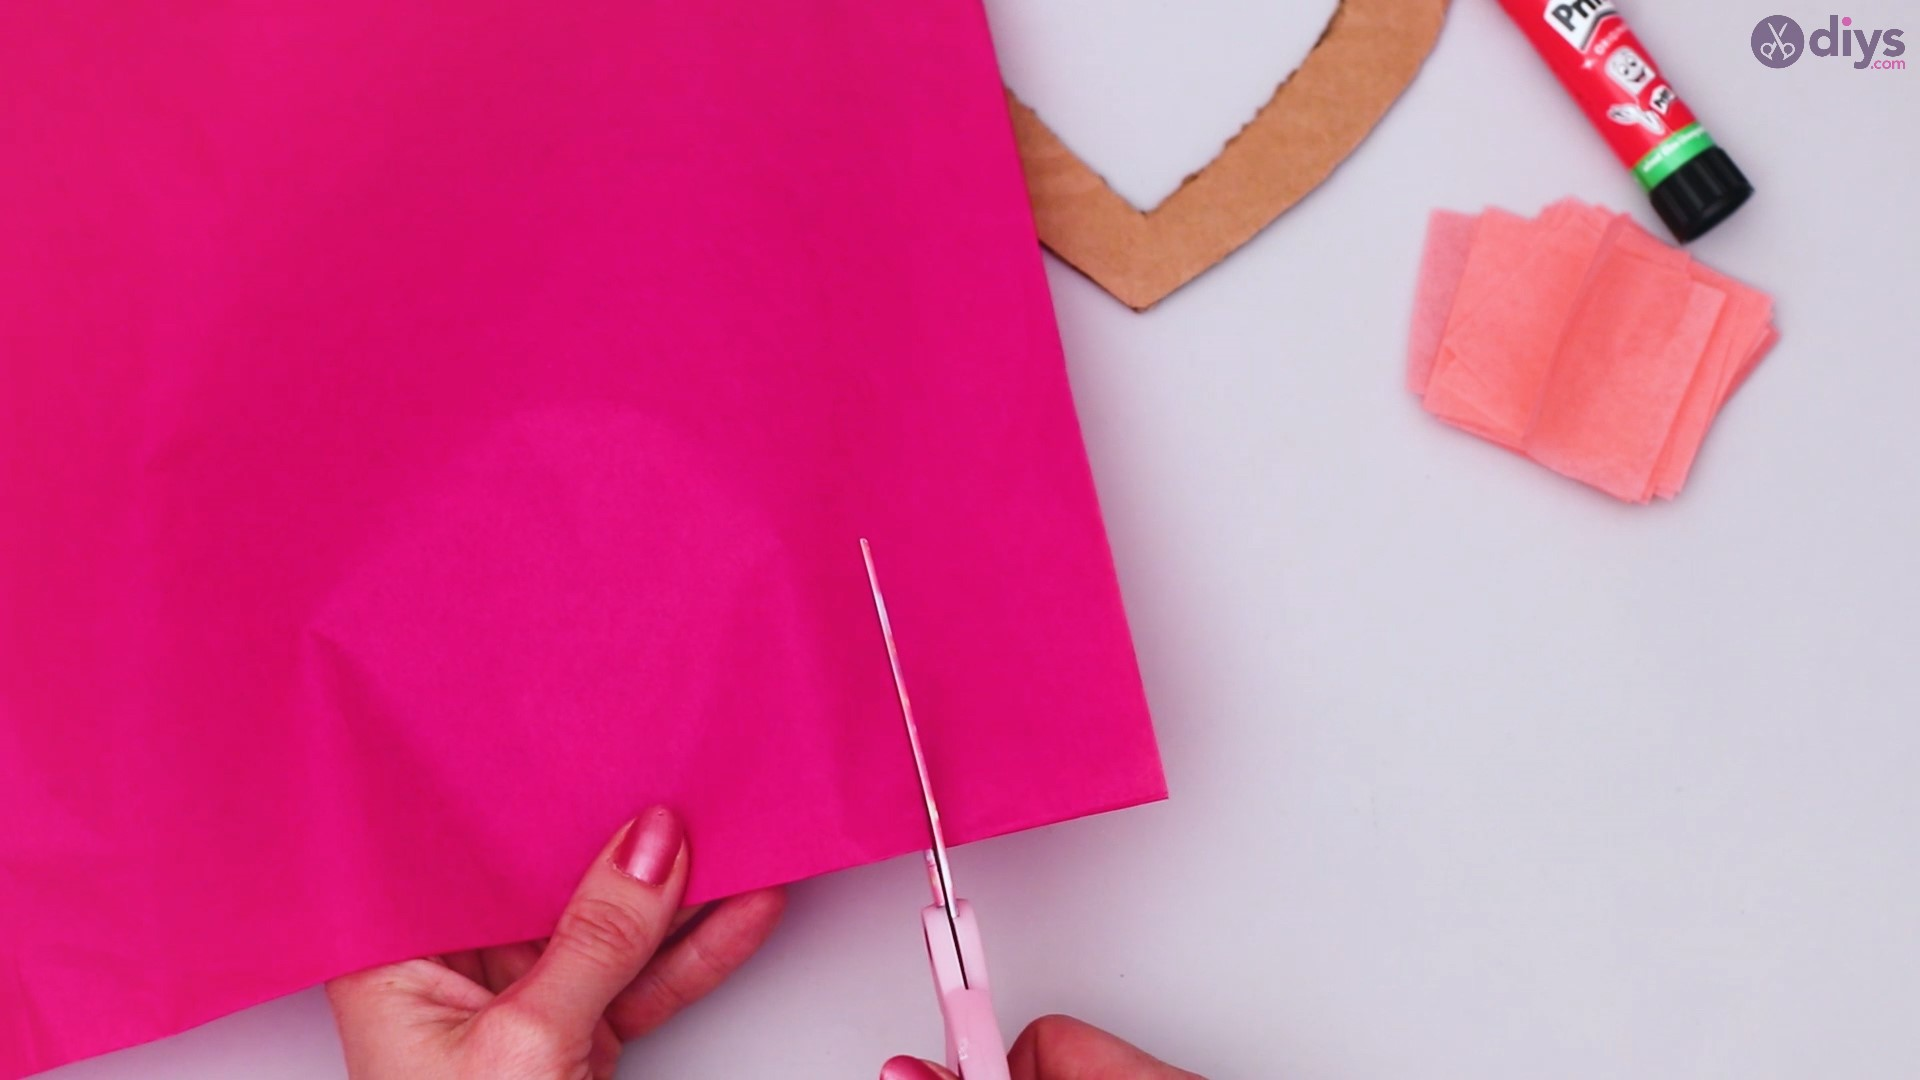 Diy tissue paper puffy heart step 1 (11)